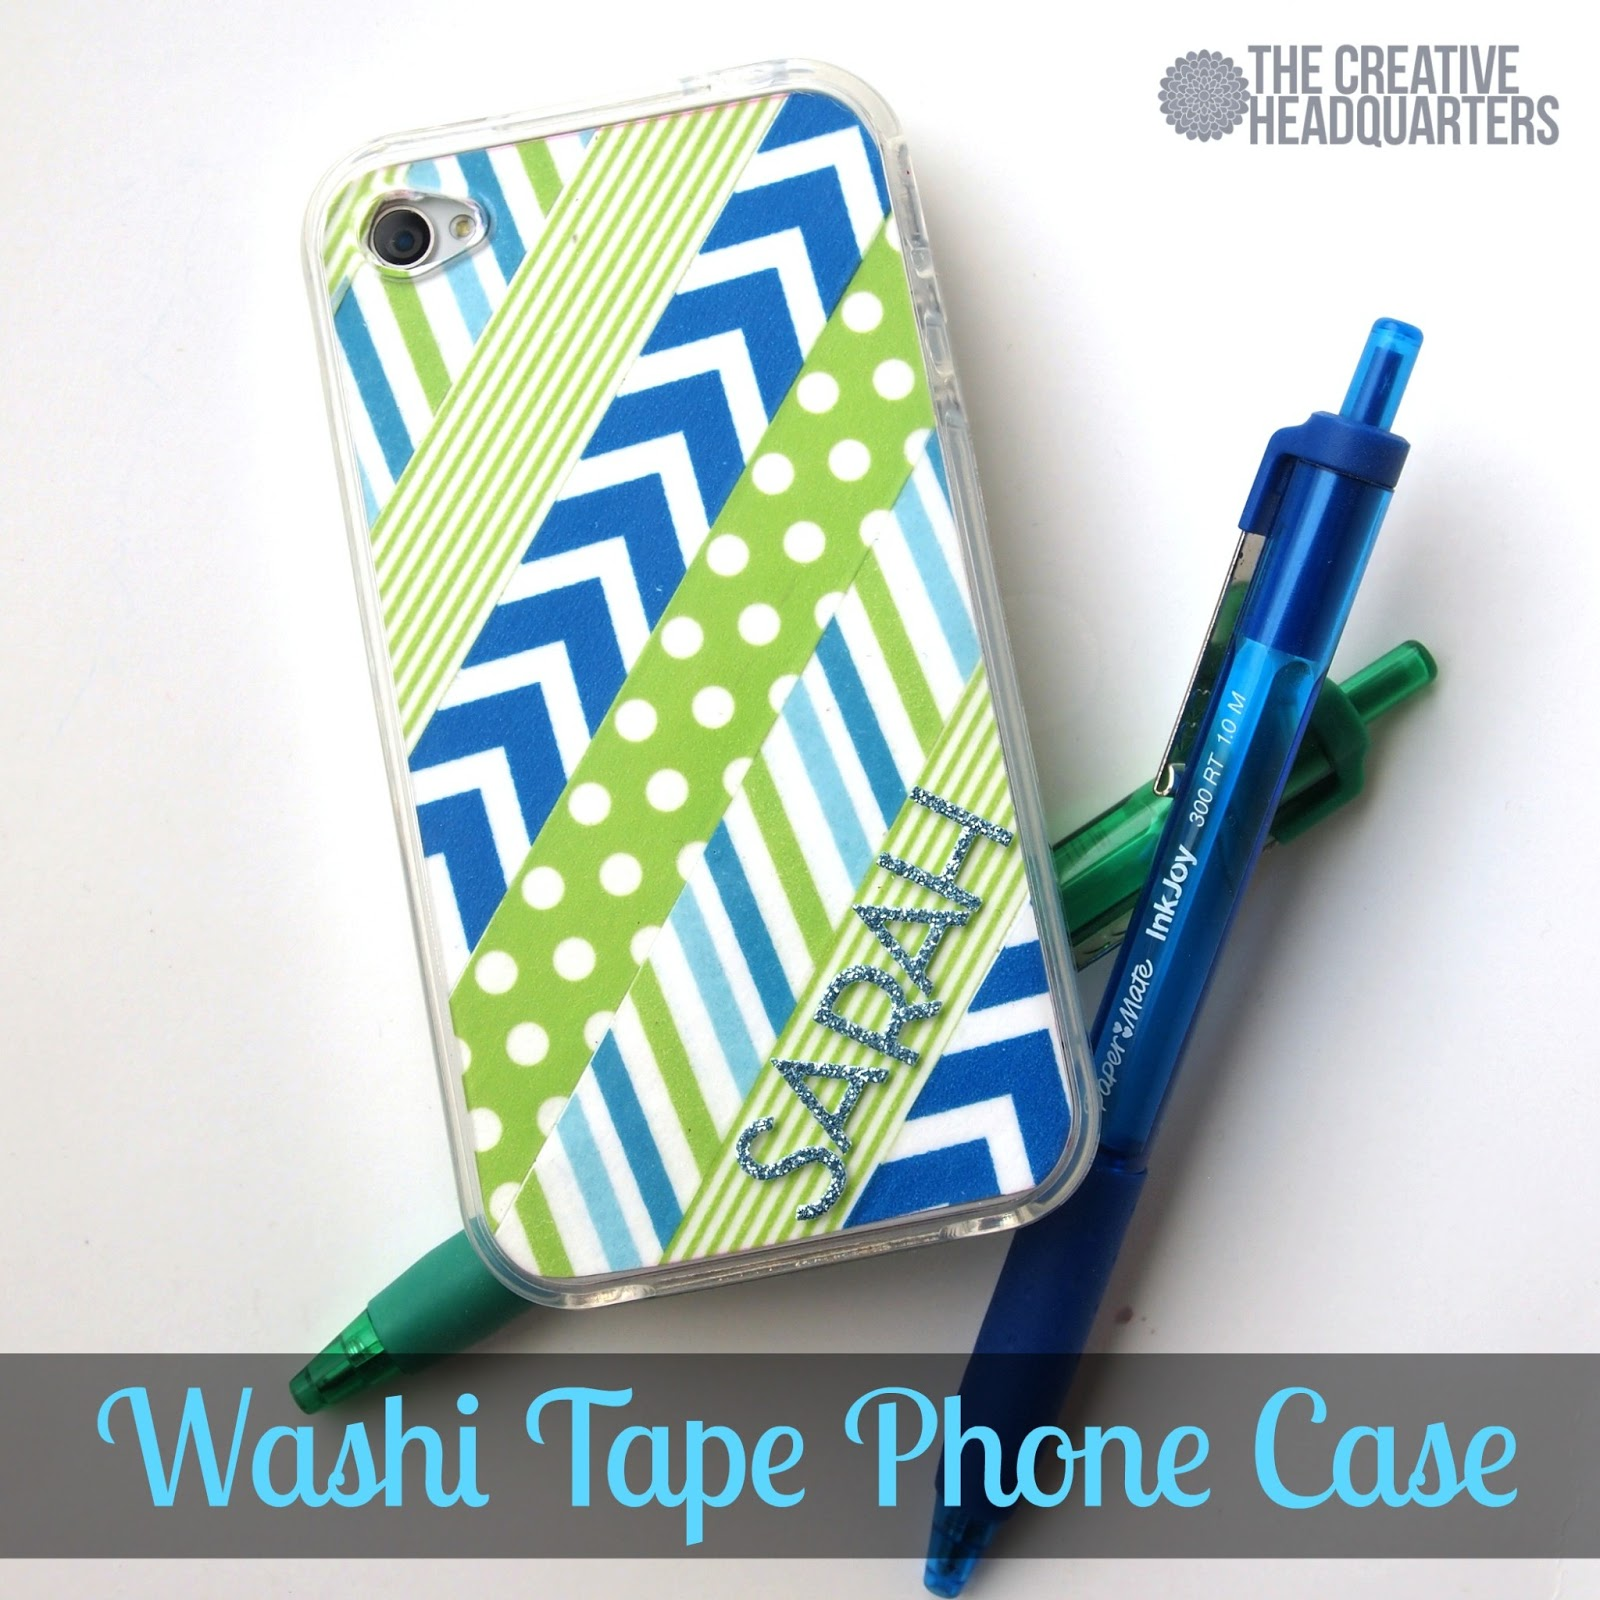 Csin ld magad gyors d sz t s dekortapasszal urban eve for Washi tape phone case